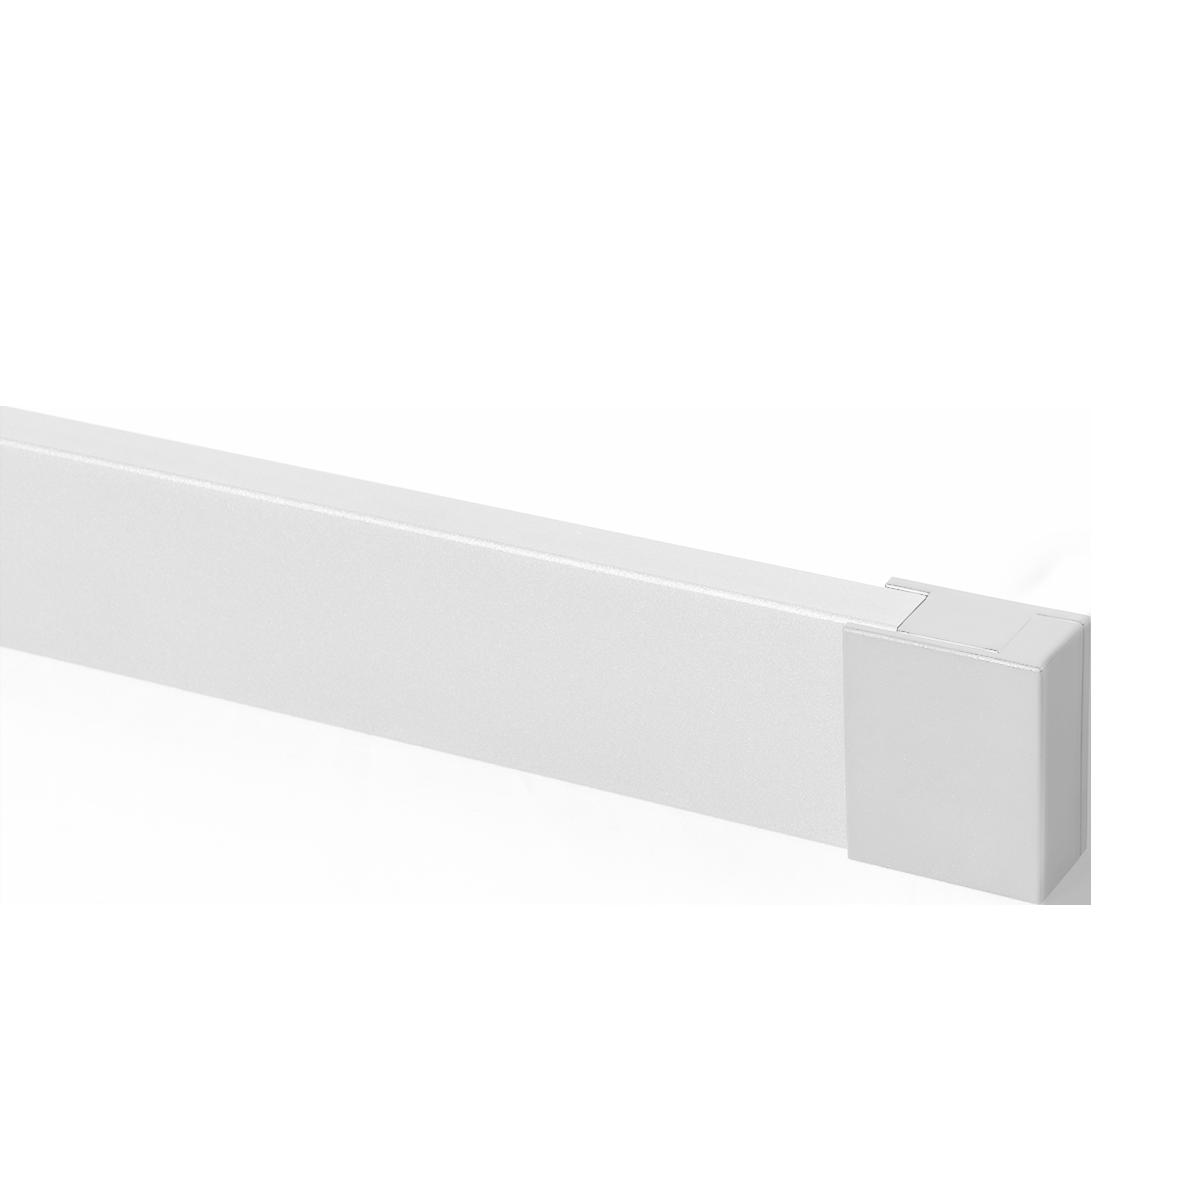 Küchenabschlussleiste Bauhaus ~ wandabschlussleiste arbeitsplatte ttci info